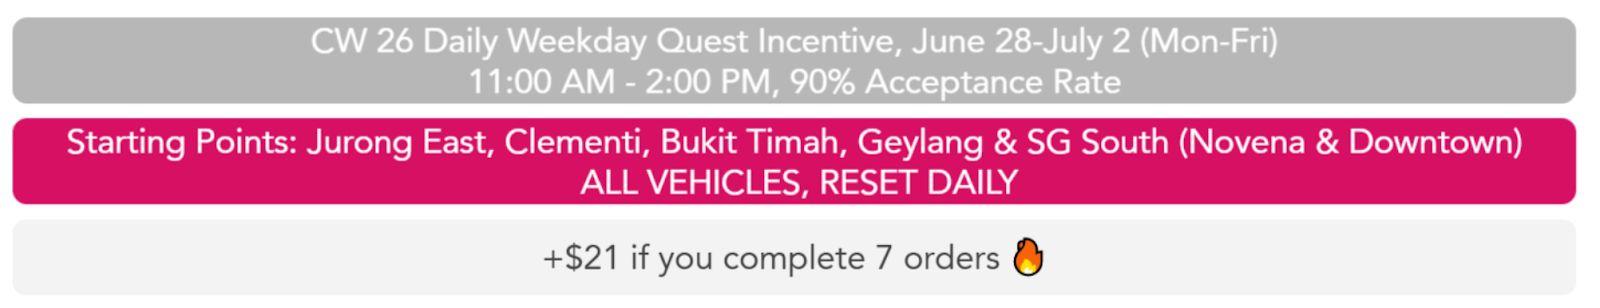 Quest incentives